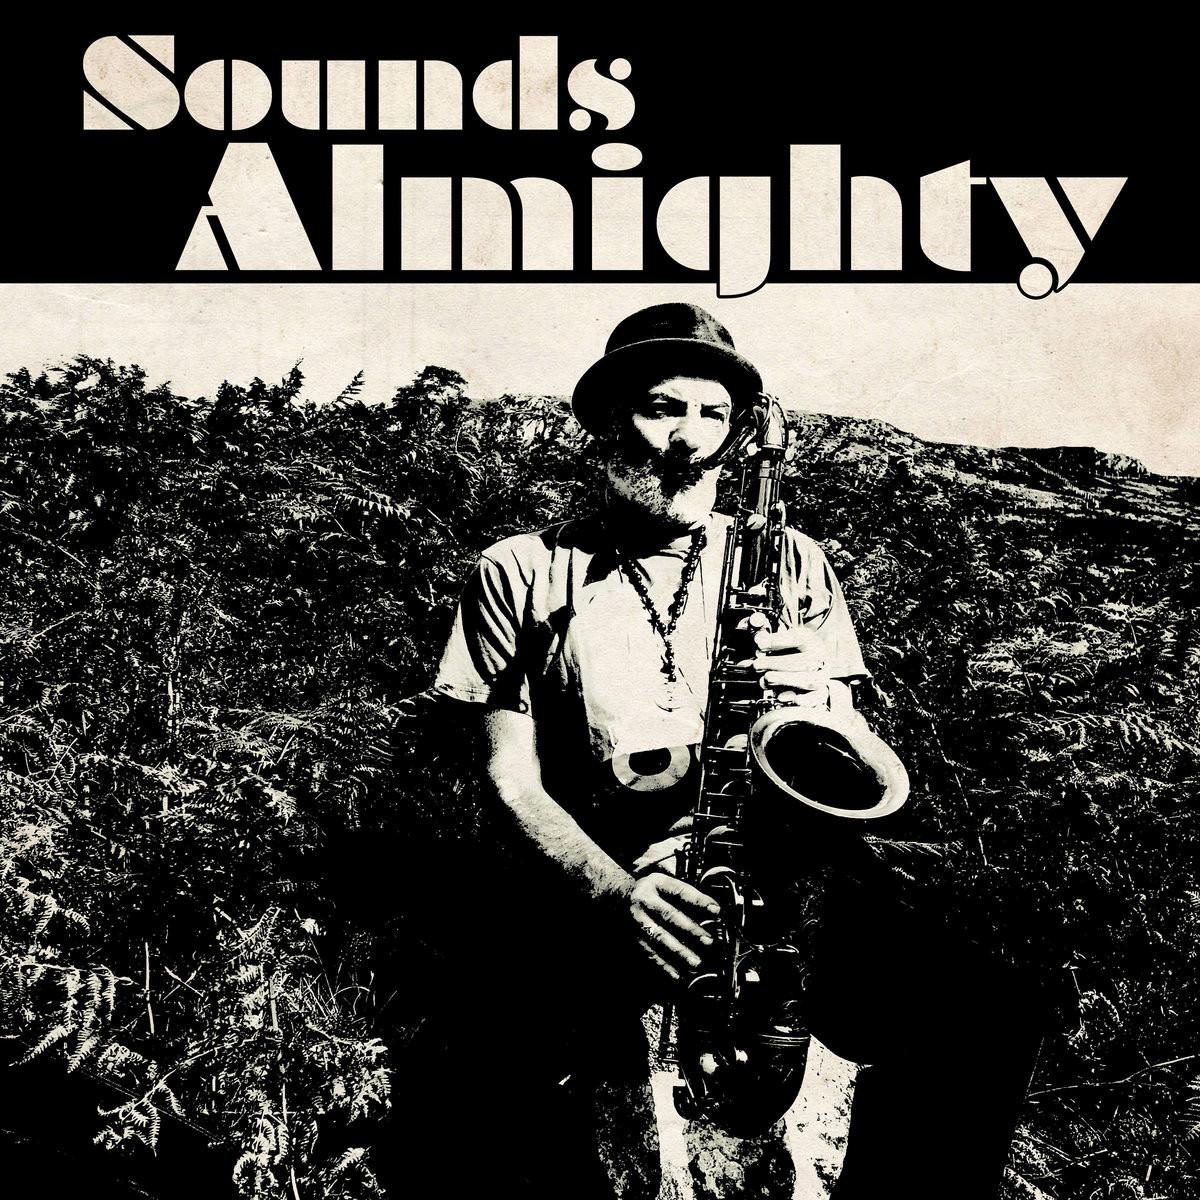 NAT BIRCHALL MEETS AL BREADWINNER - Sounds Almighty LP